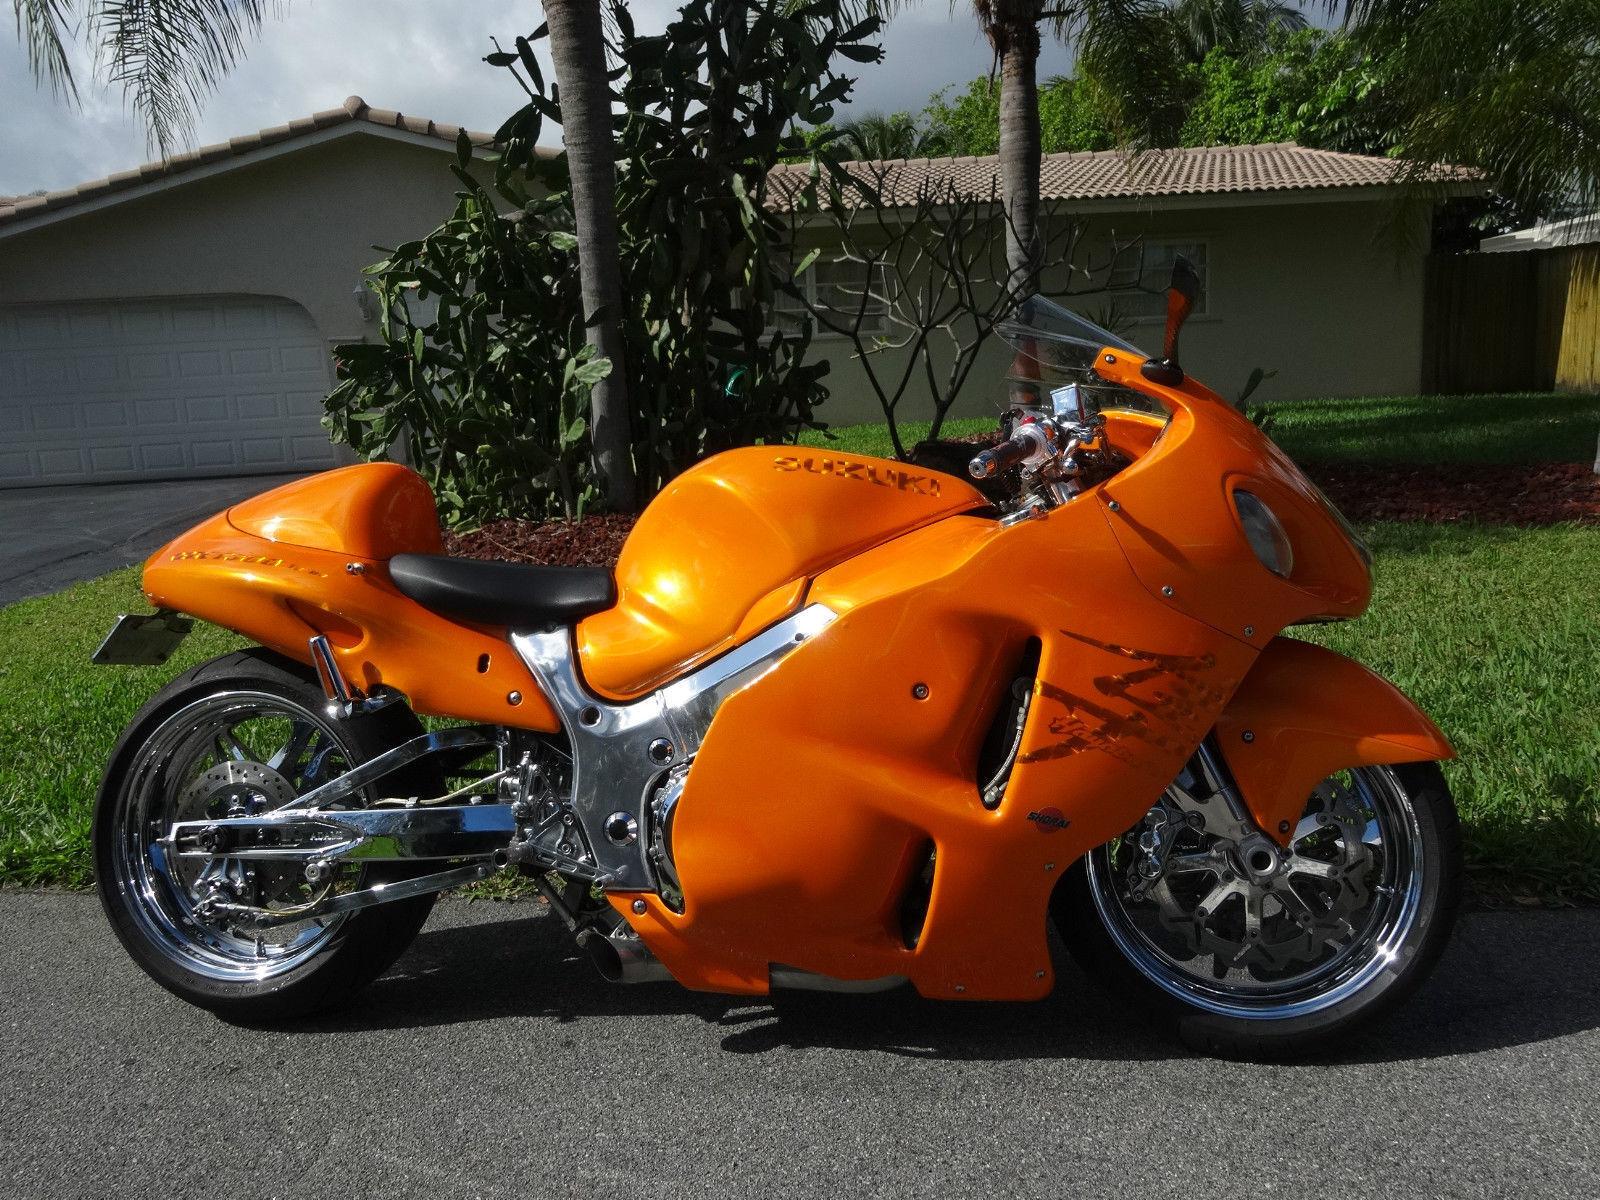 hayabusa 2000 suzuki fastest motorcycles mph km motorcycle turbo motorbikes wheels florida bike owner turbocharged bikes sportbikes wheel hp cars